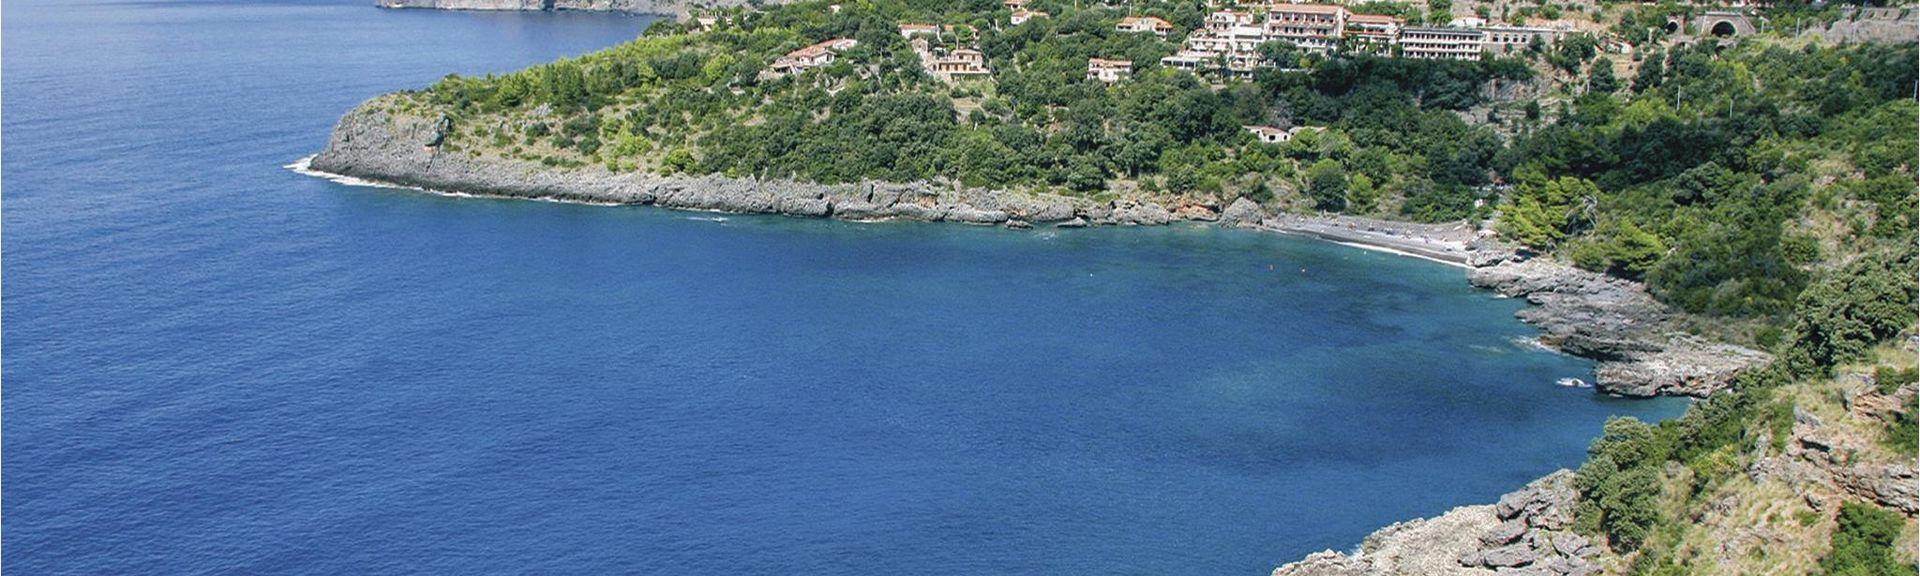 Stalettì, Catanzaro, Calabria, Italy